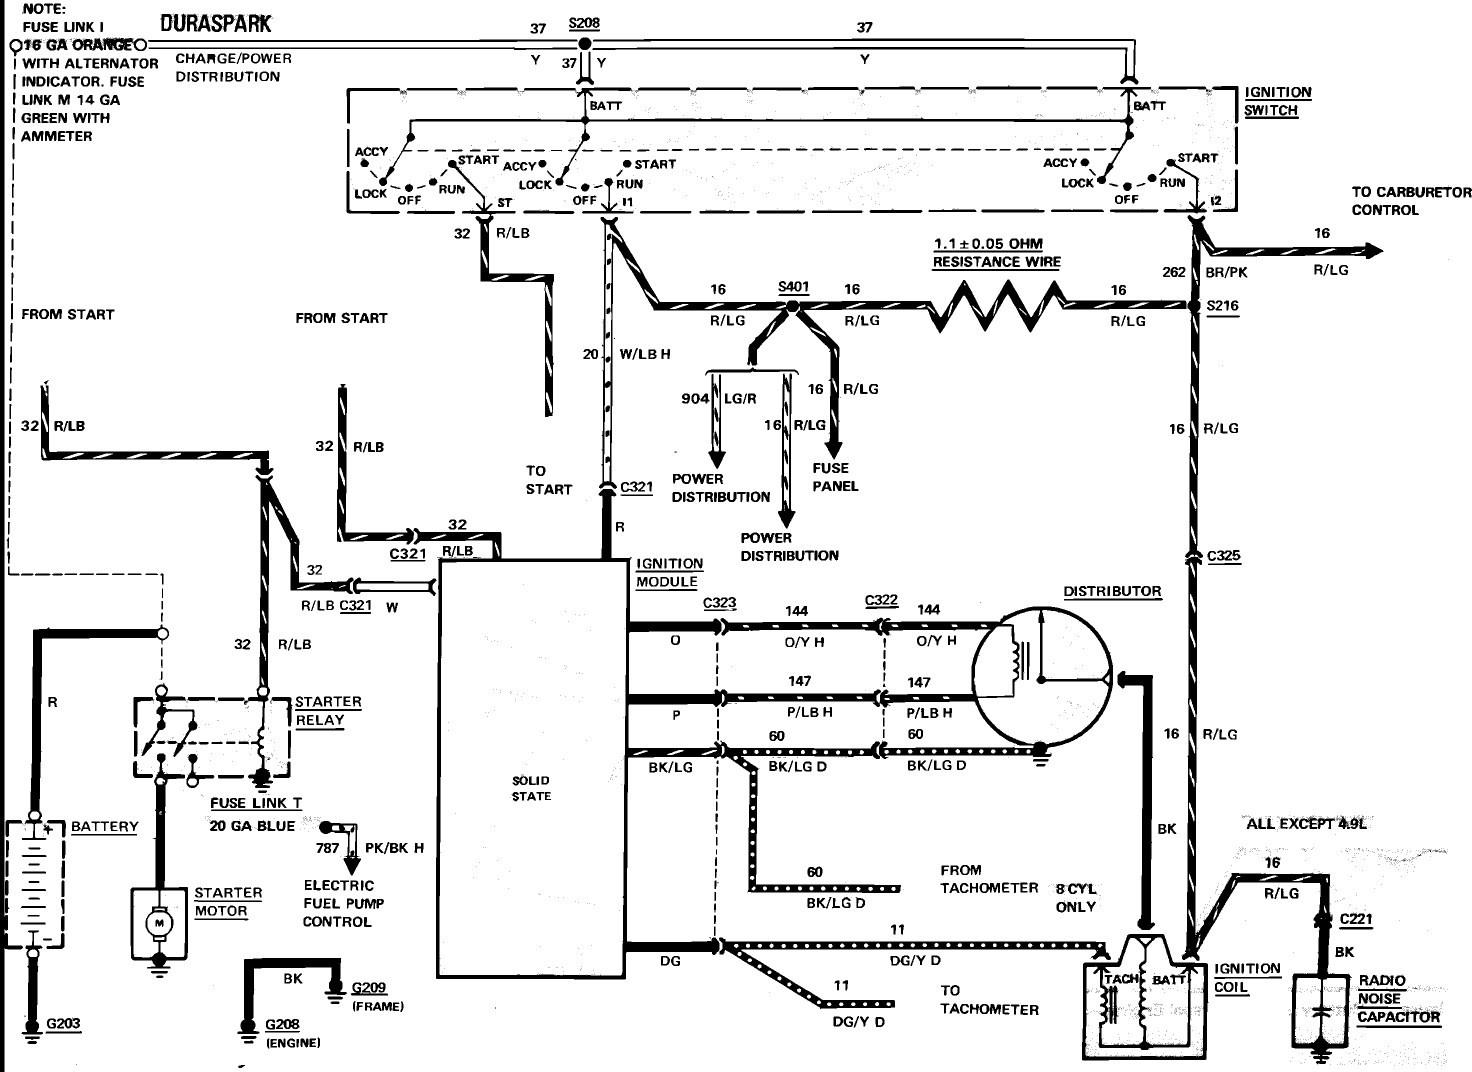 1987 ford f 250 wiring diagram wiring diagram databaseford f150 ignition wiring diagram